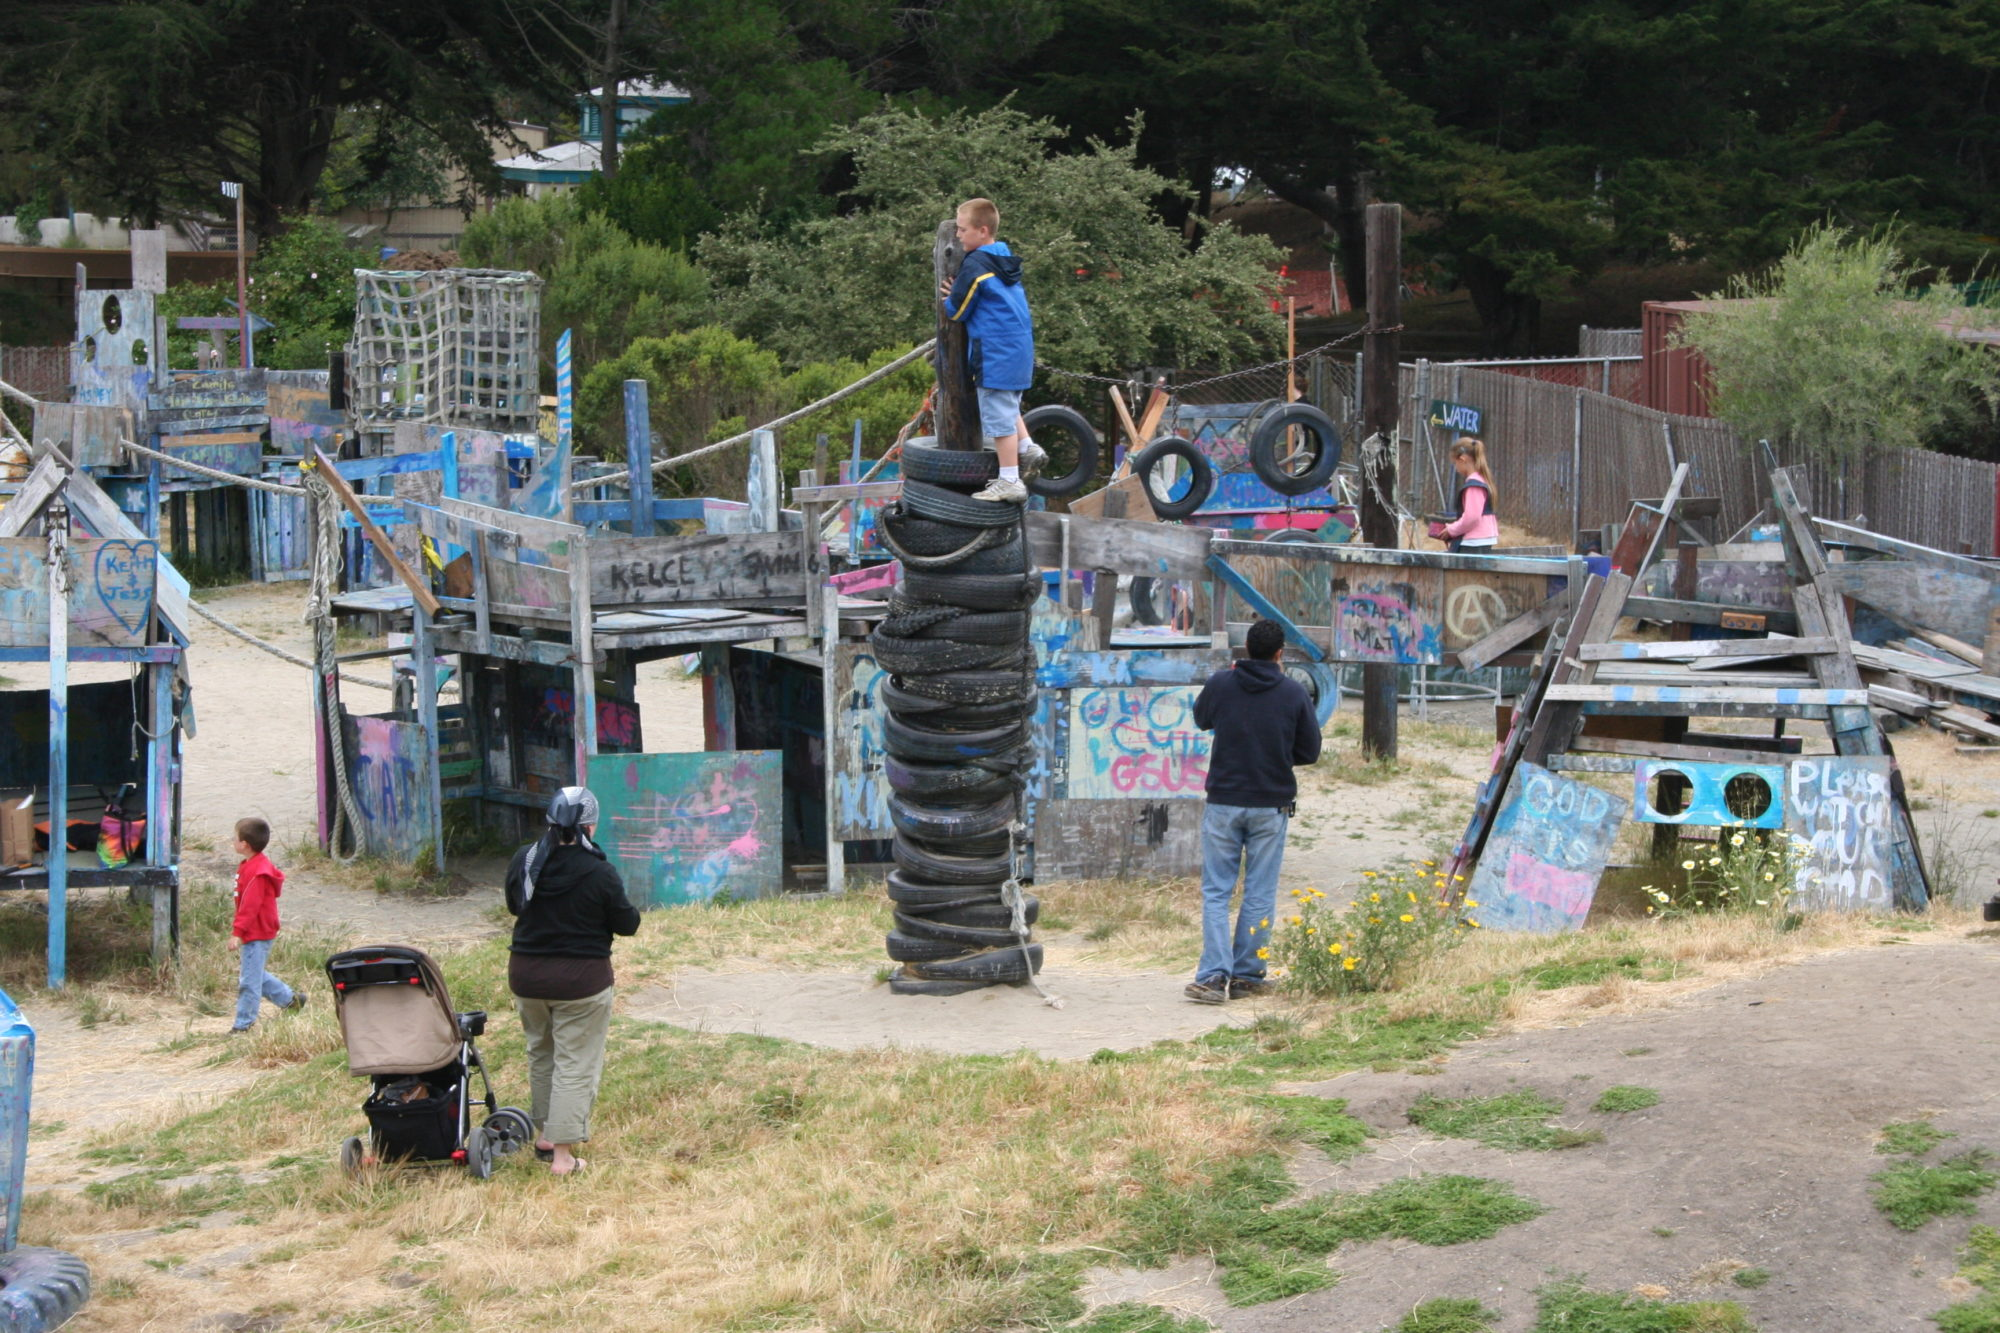 Adventure-Playground-Berkeley-CA-Courtesy-of-Adventure-Playground-e1466111622702